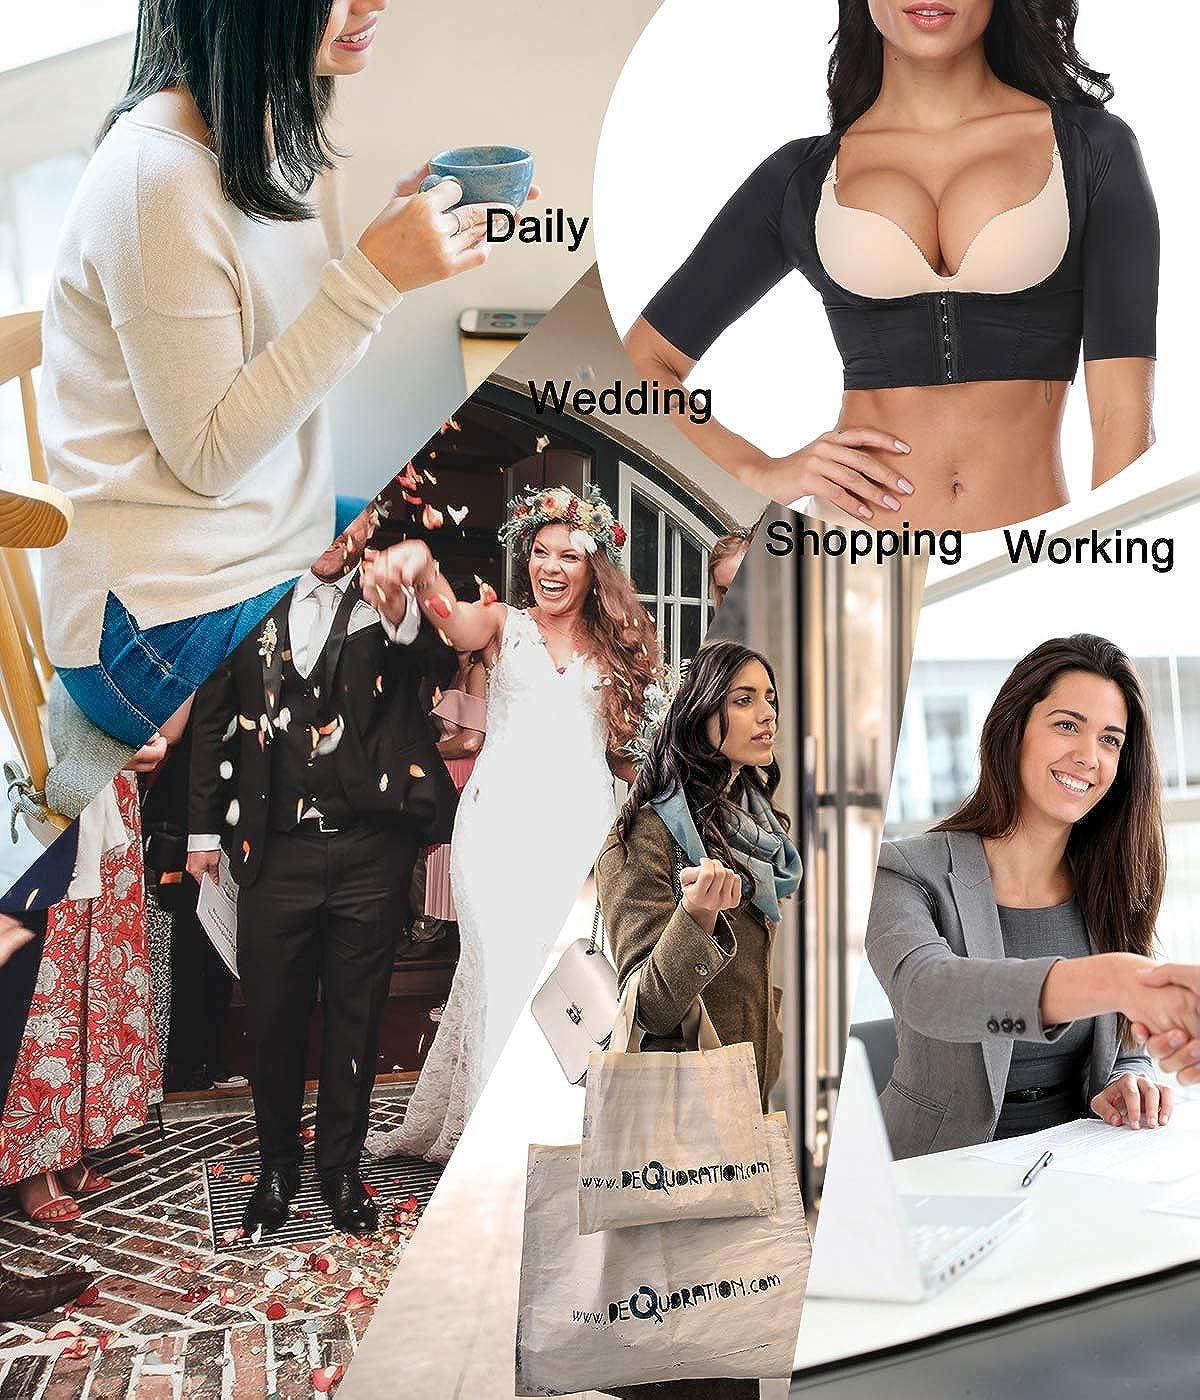 SLIMBELLE Womens Seamless Arm Shaper Slim Upper Sleeves Top Body Shaper Compression Vest Posture Corrector